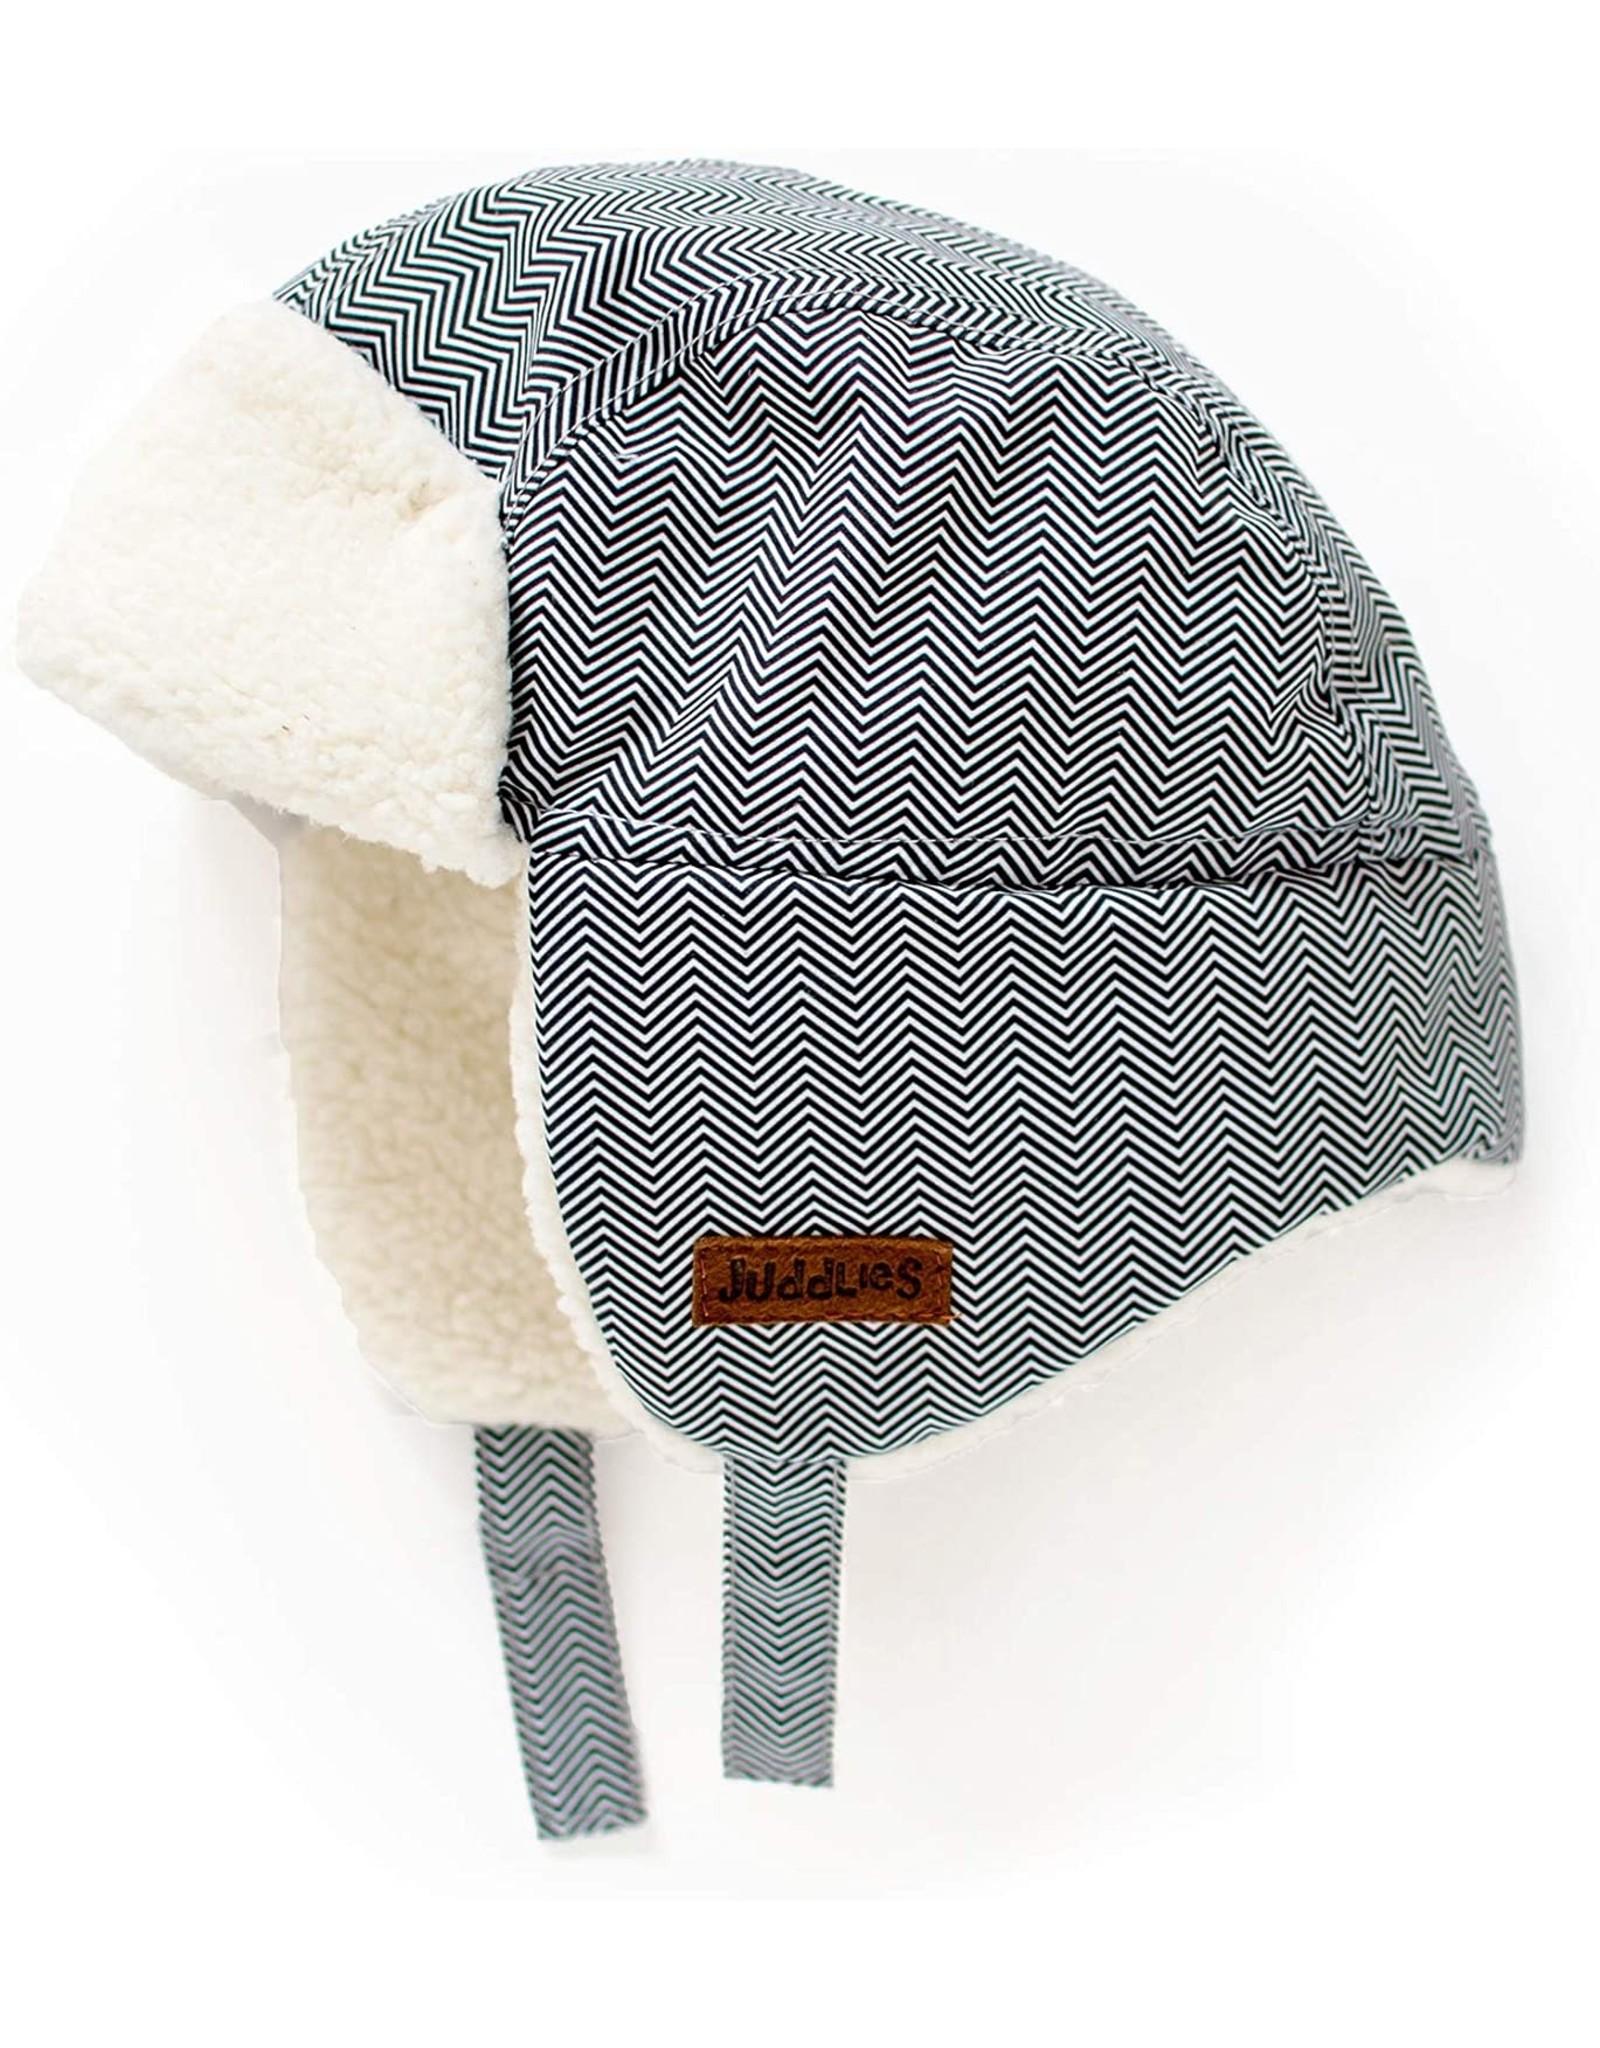 Juddlies Juddlies Winter Hats Herringbone Grey 0-6M